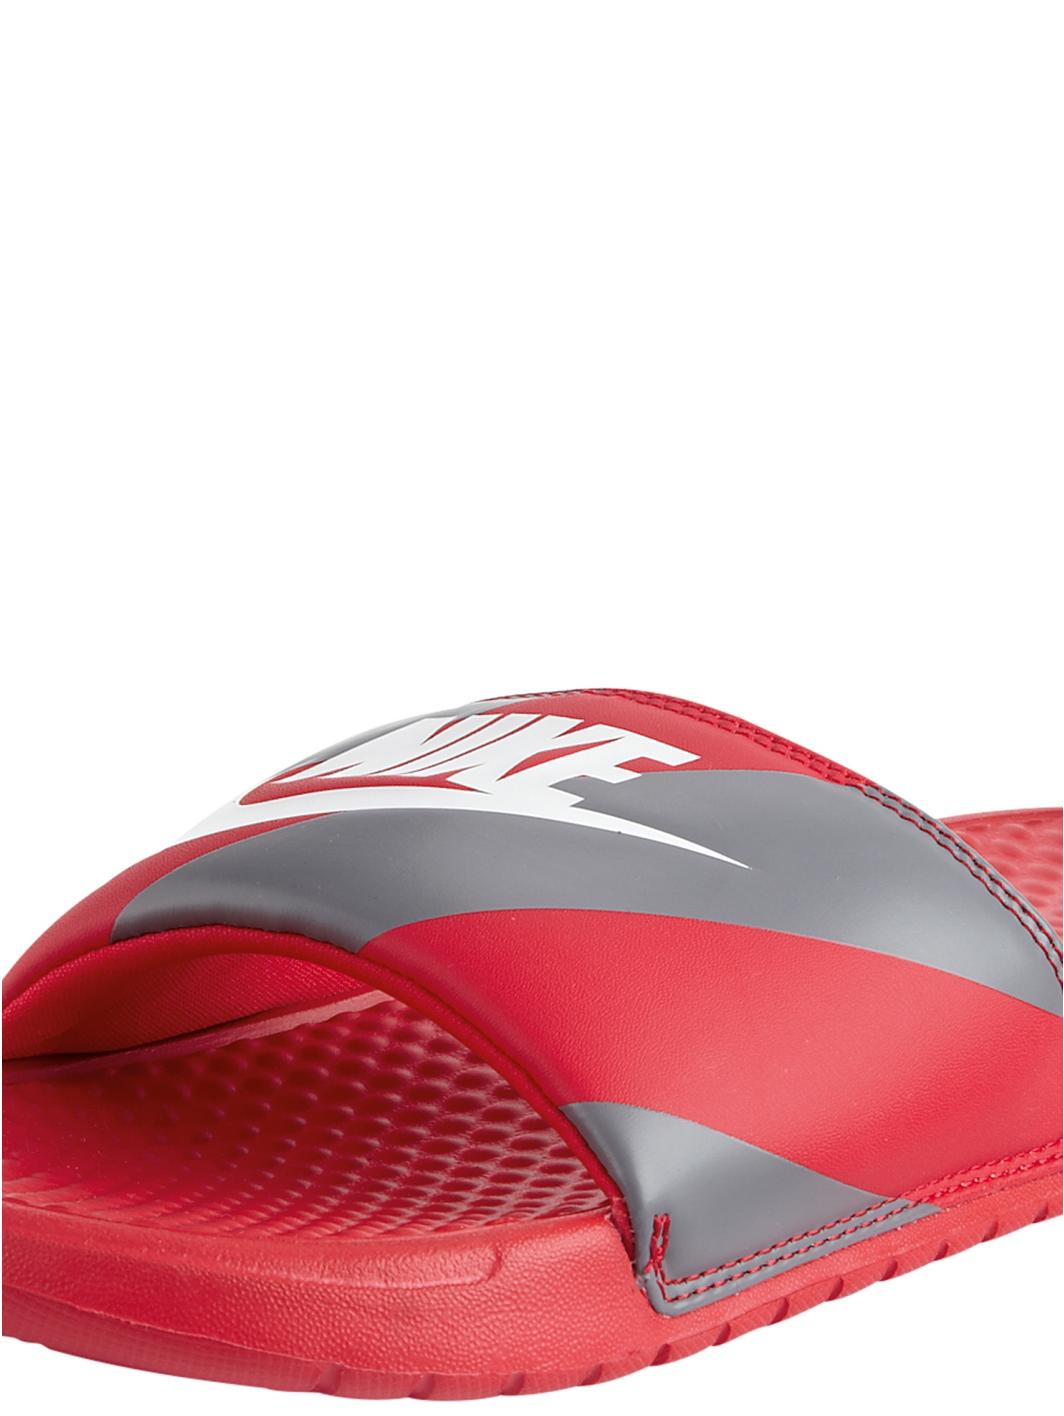 Nike Benassi Jdi Print Flip Flops In Red For Men Red Grey